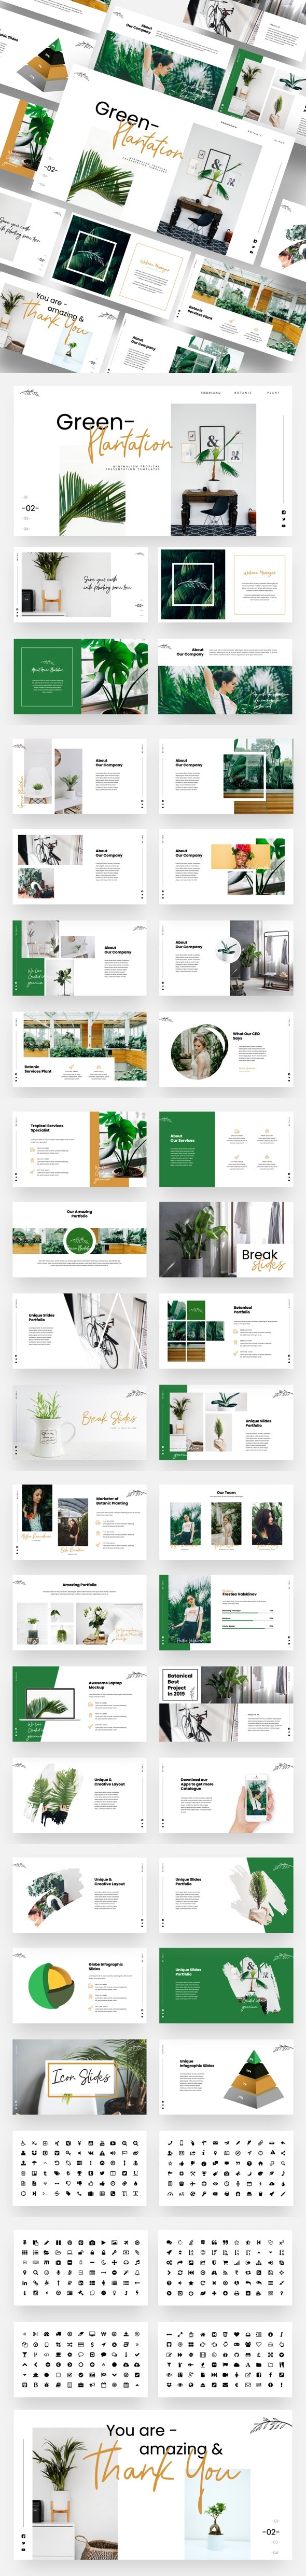 Green Plantation - Botanic & Tropical Powerpoint Template - Creative PowerPoint Templates